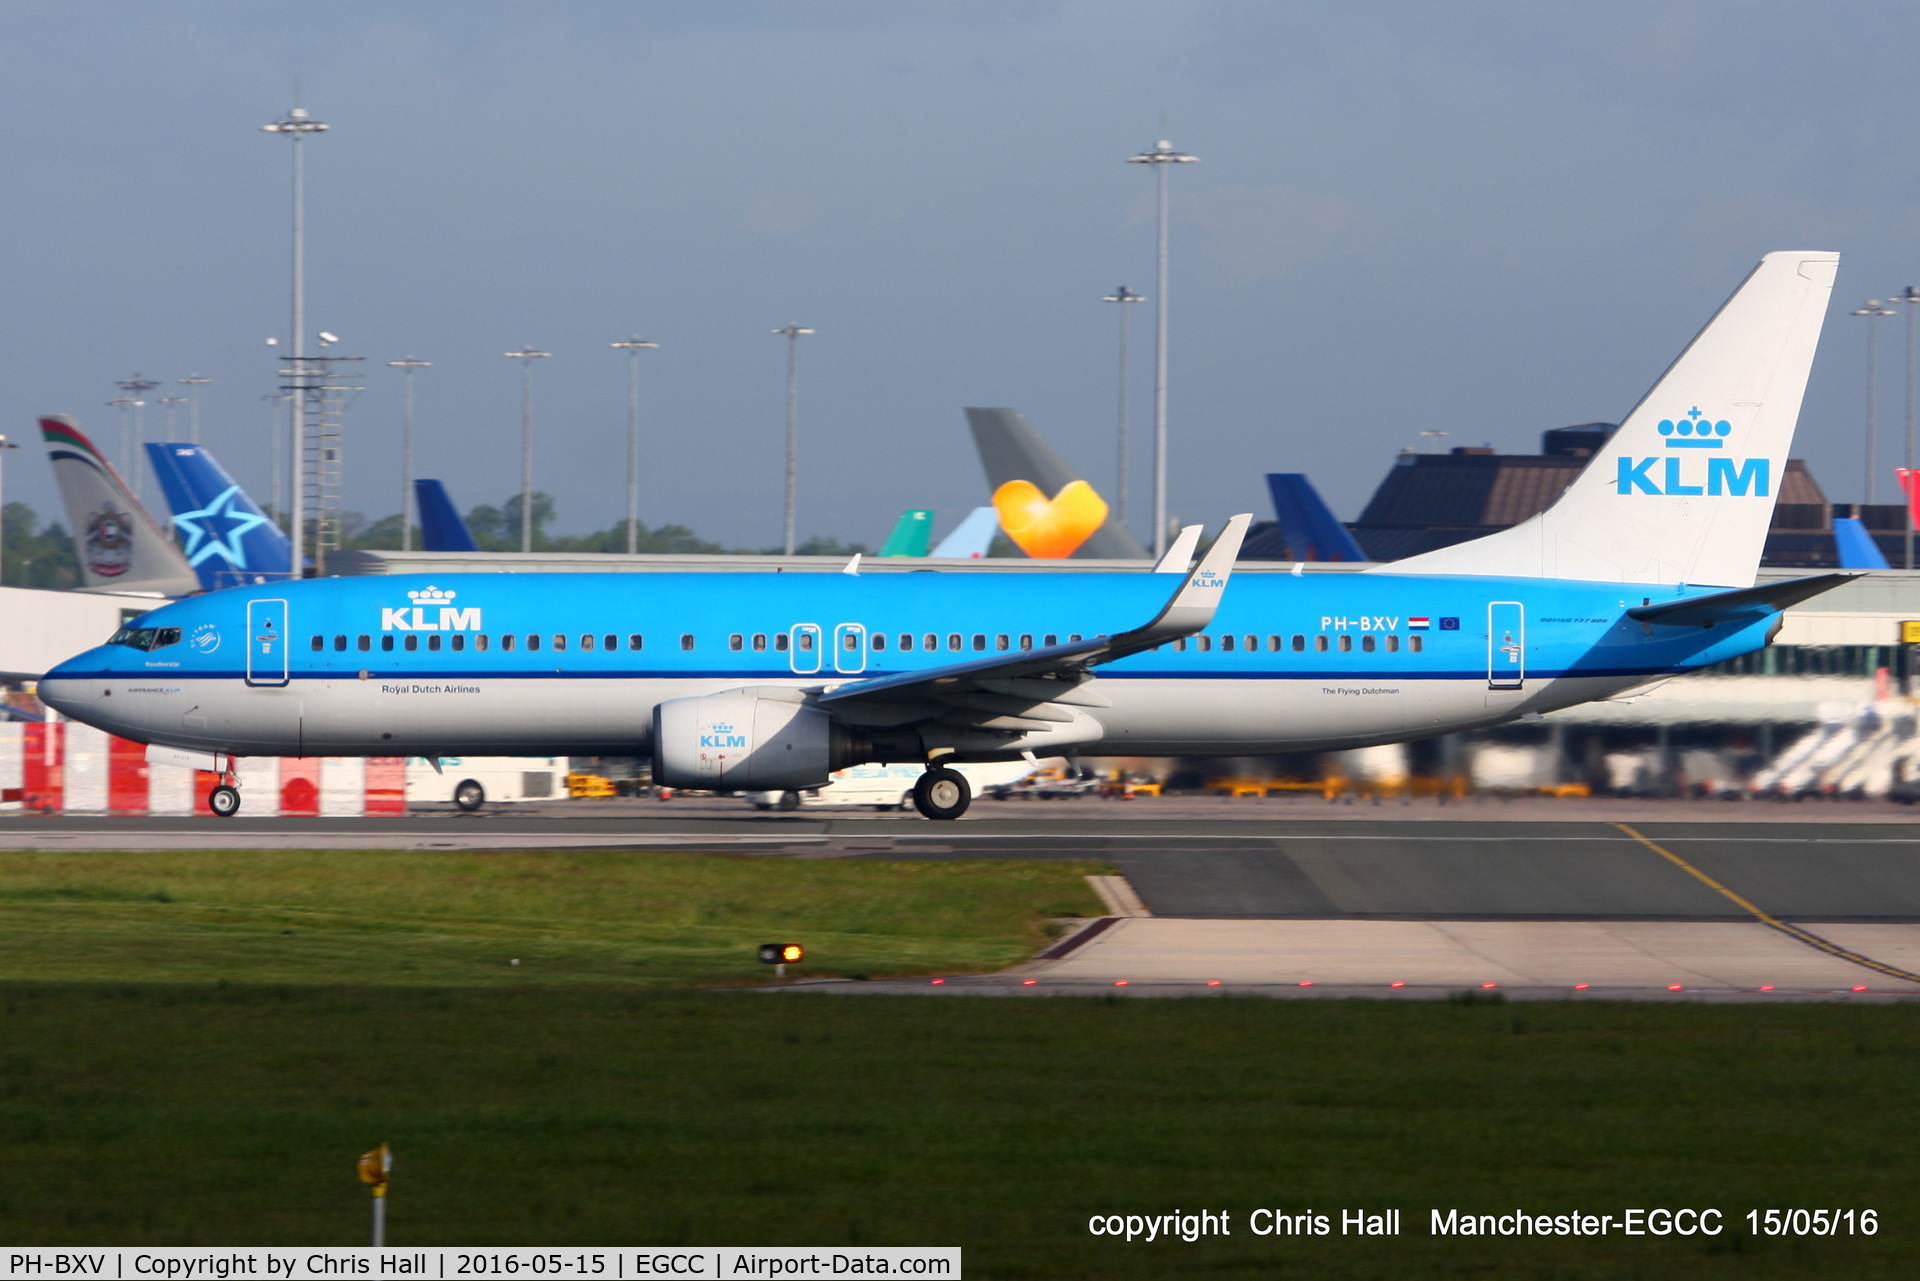 PH-BXV, 2007 Boeing 737-8K2 C/N 30370, KLM Royal Dutch Airlines